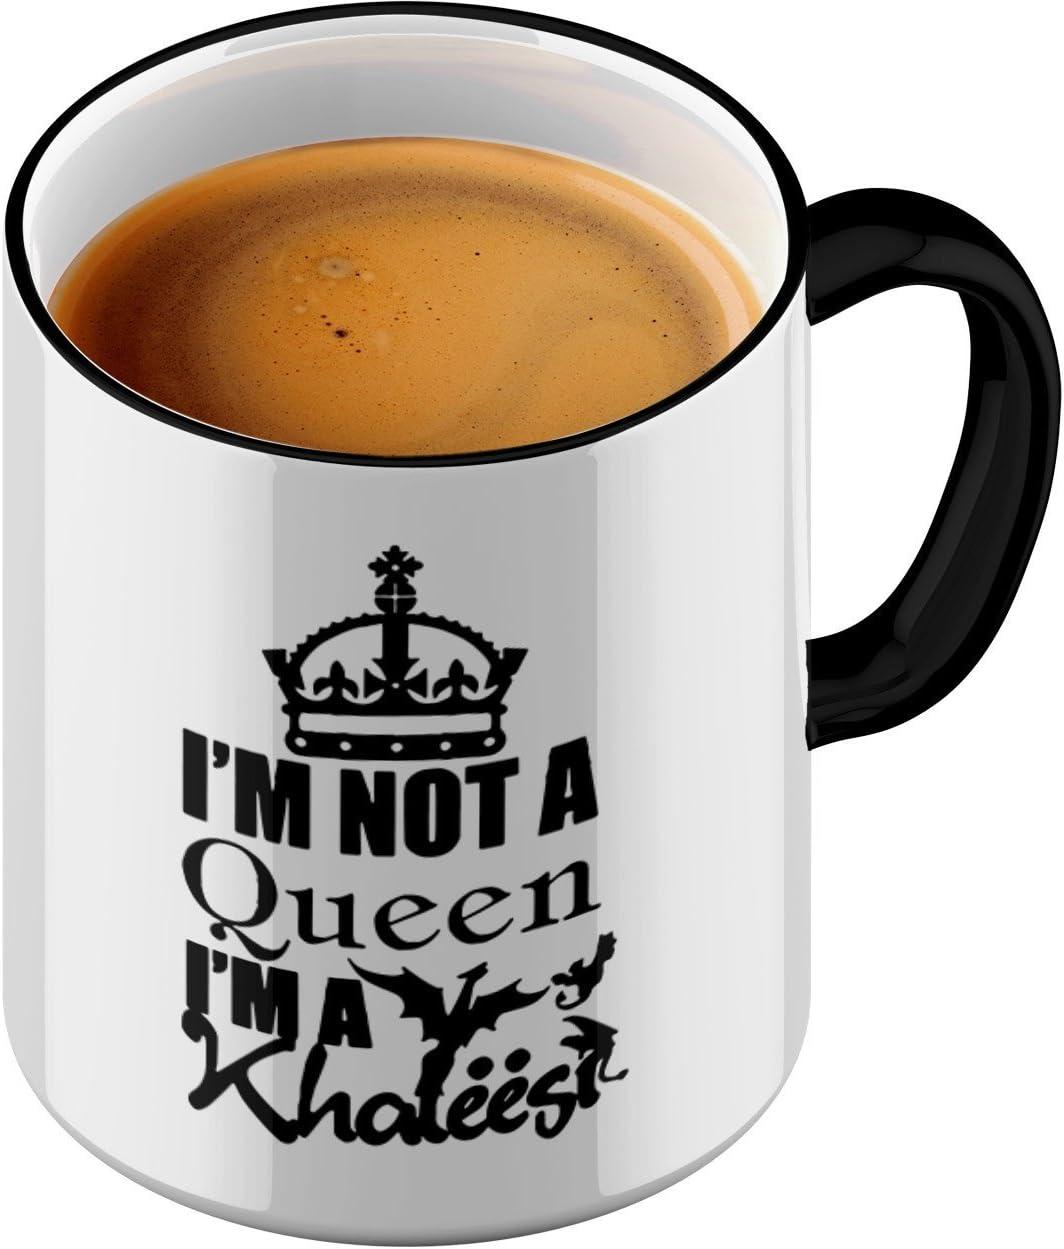 Fun tasstic Taza I M NOT a Queen I am Khal eesi–Café Pott Café Taza by StyloTex